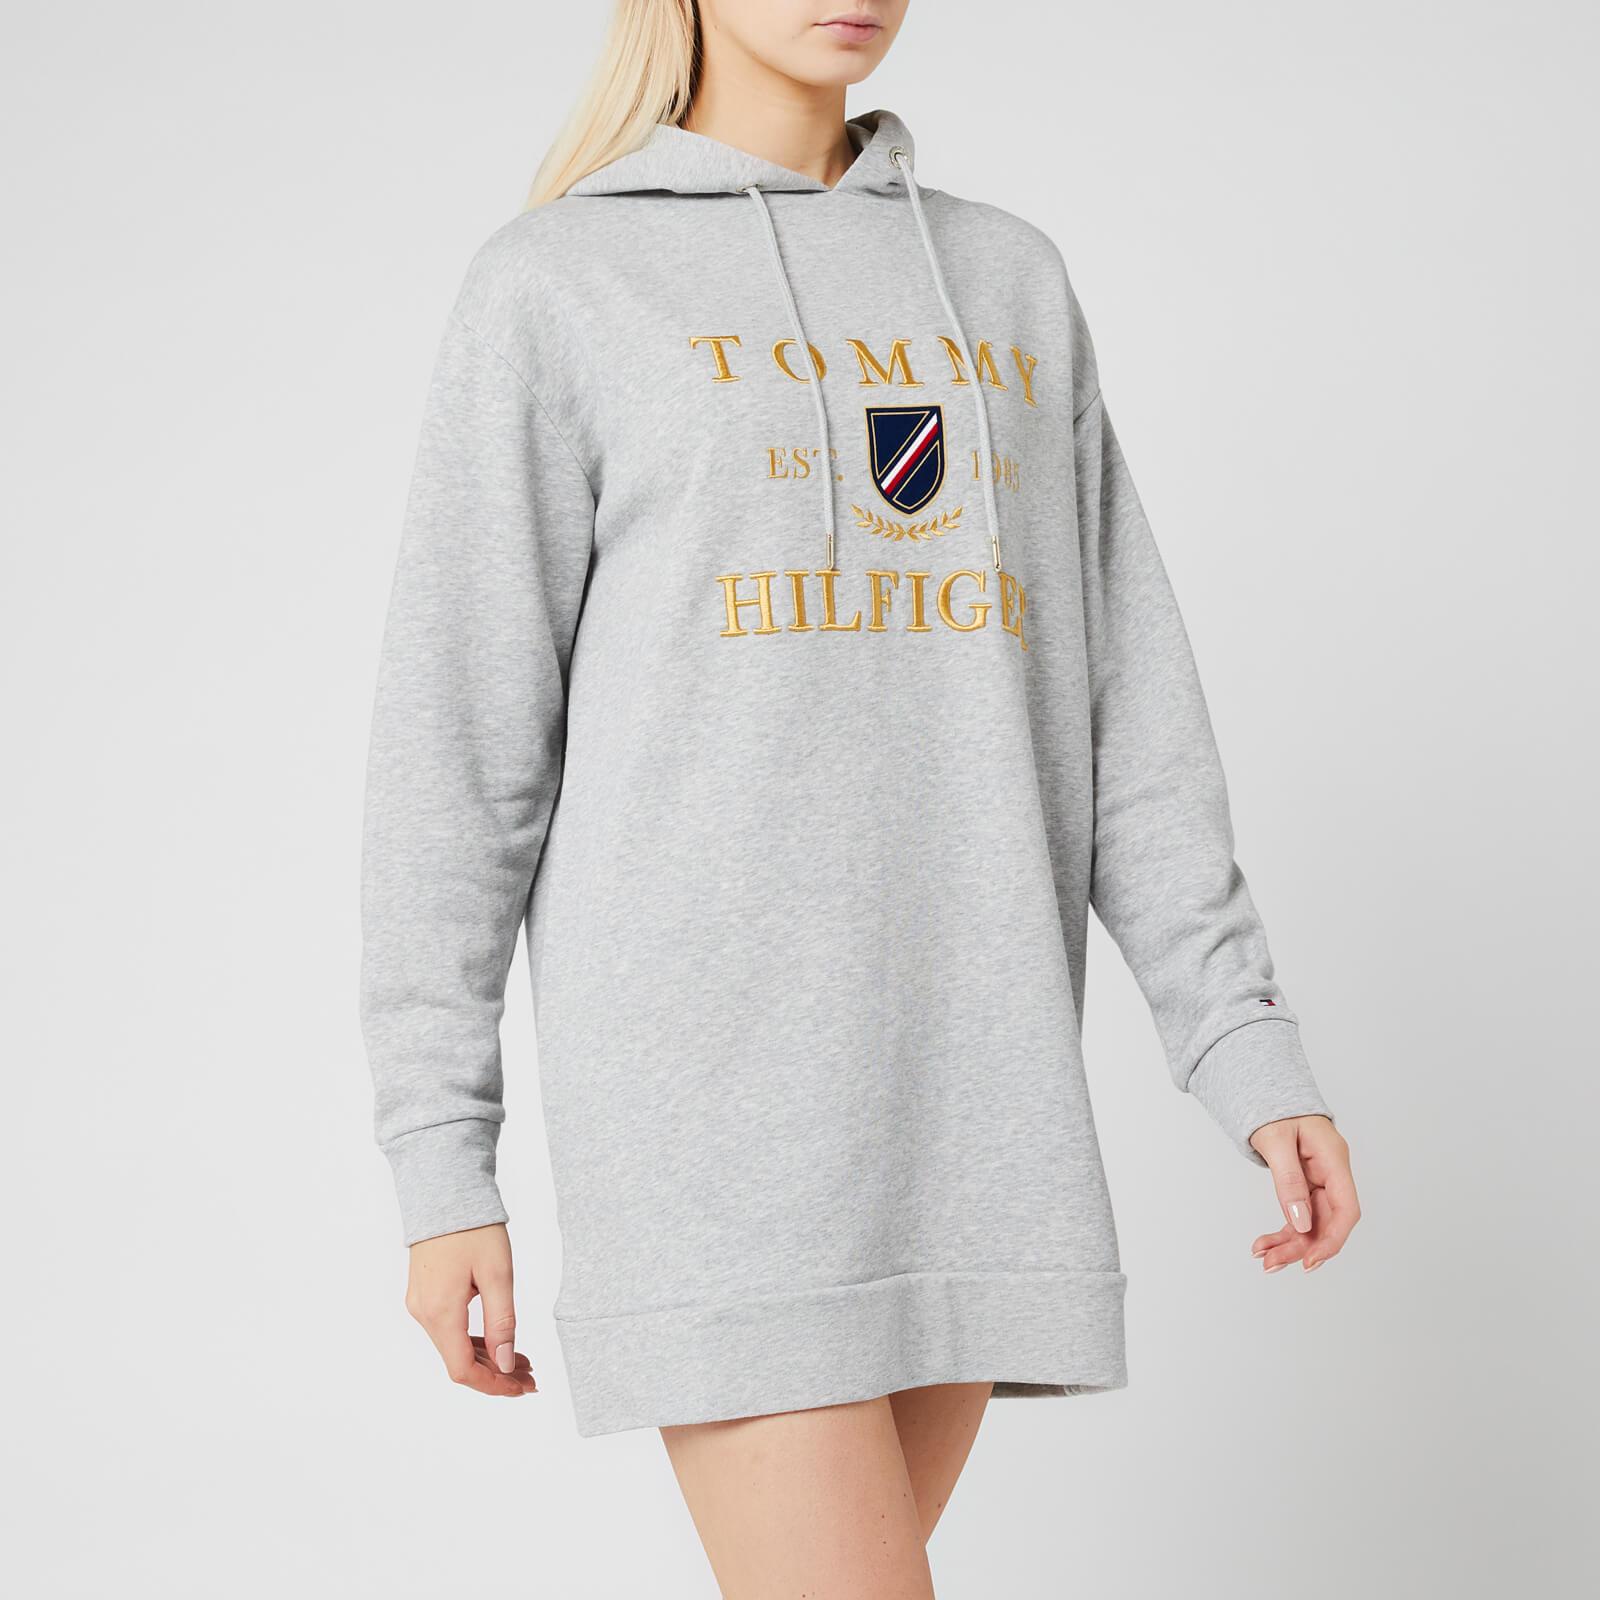 Tommy Hilfiger Women's Kristal Hooded Terry Dress Long Sleeve - Light Grey Heather - XS